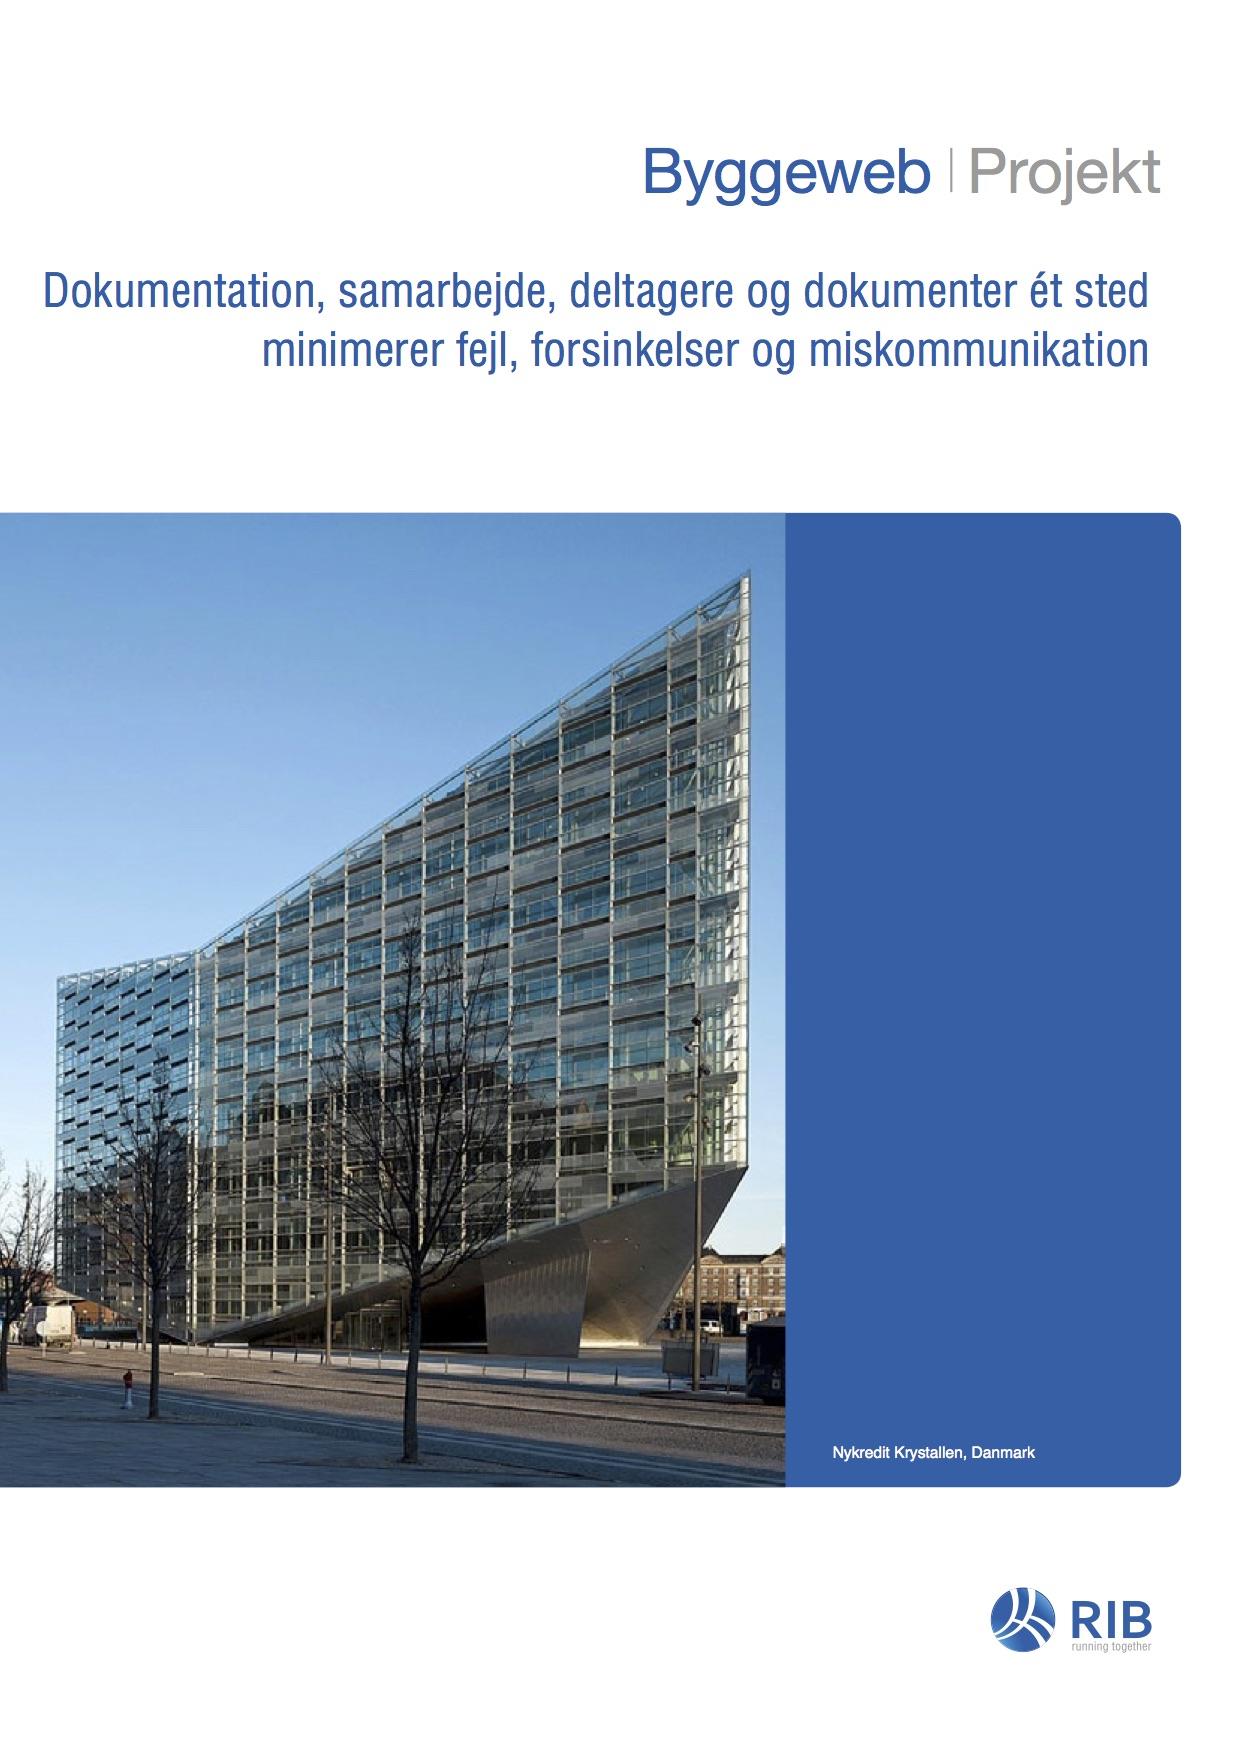 DK_RIB Brochure_Byggeweb Projekt_FULD inkl BPP_A4.jpg